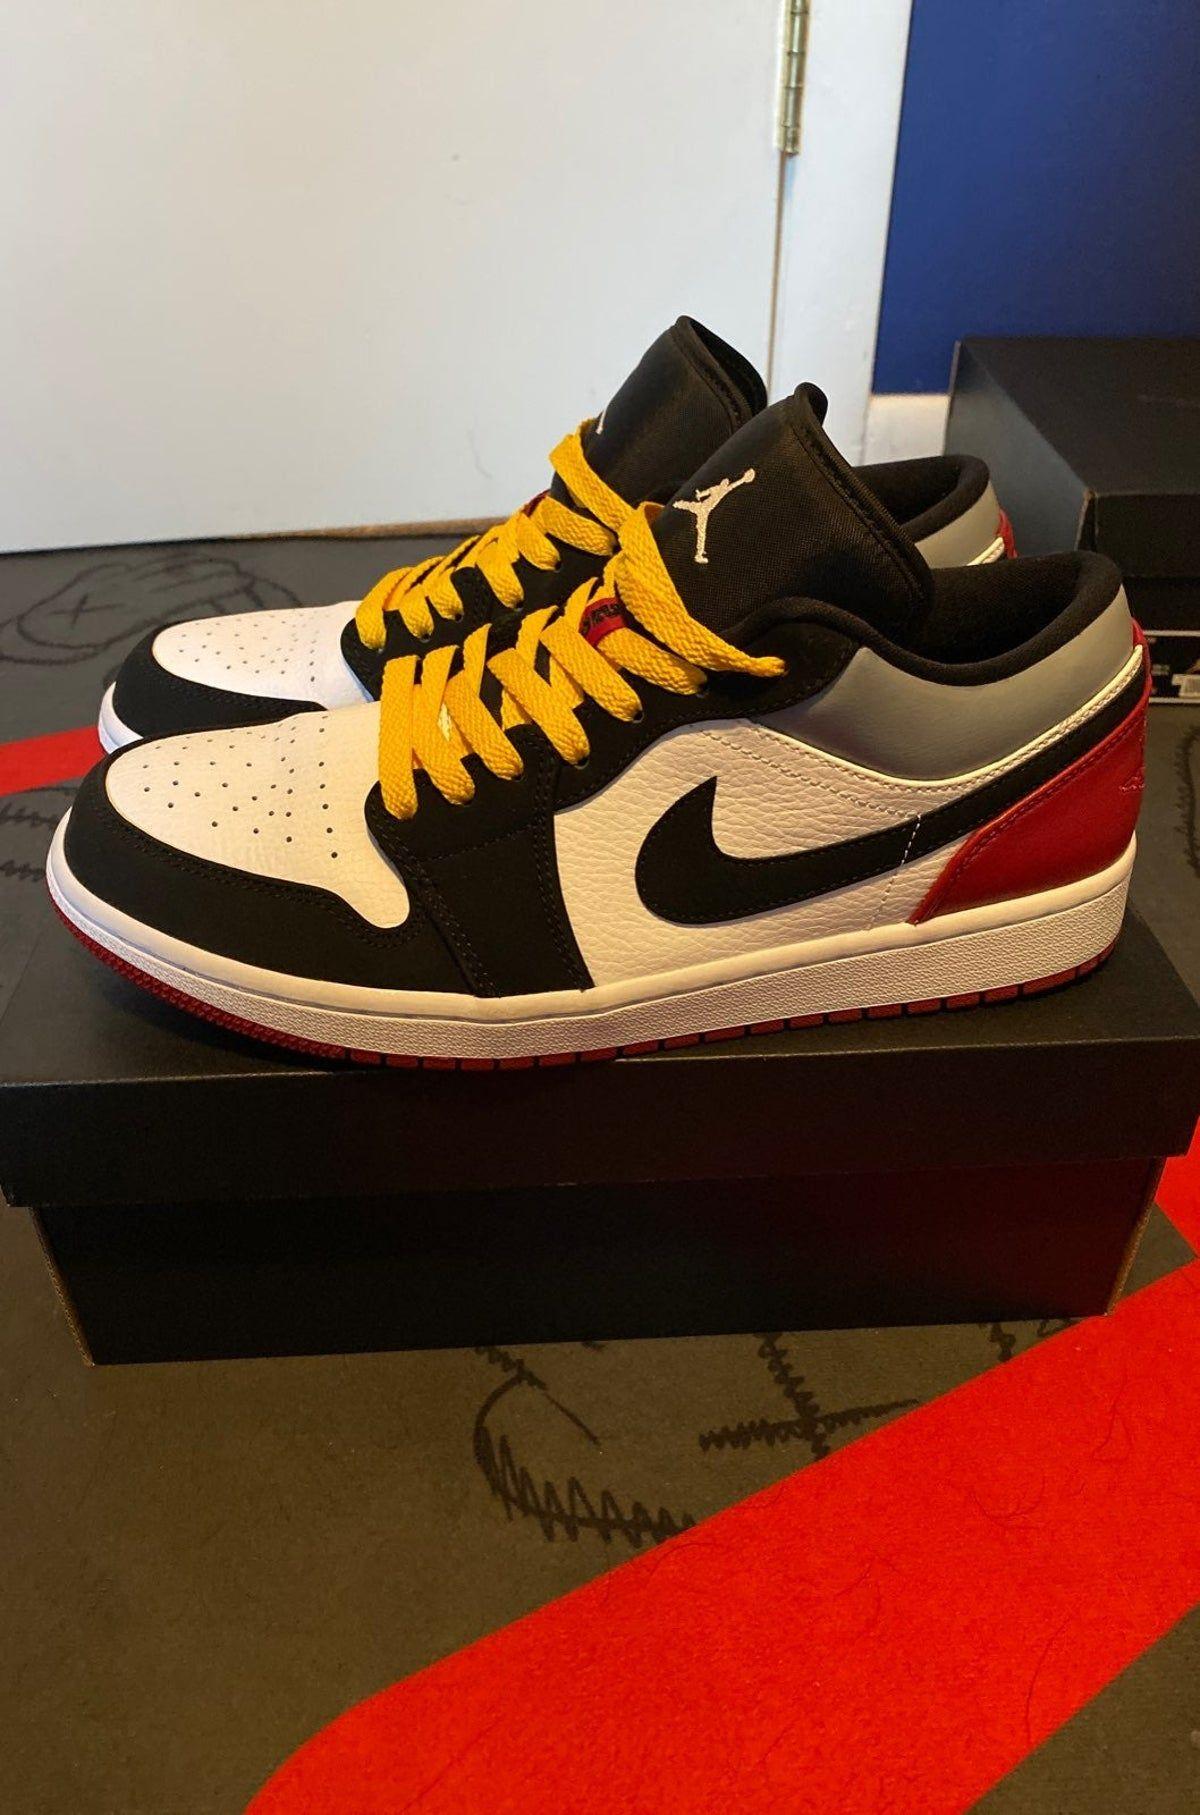 Custom Jordan 1 Low Union Black in 2020